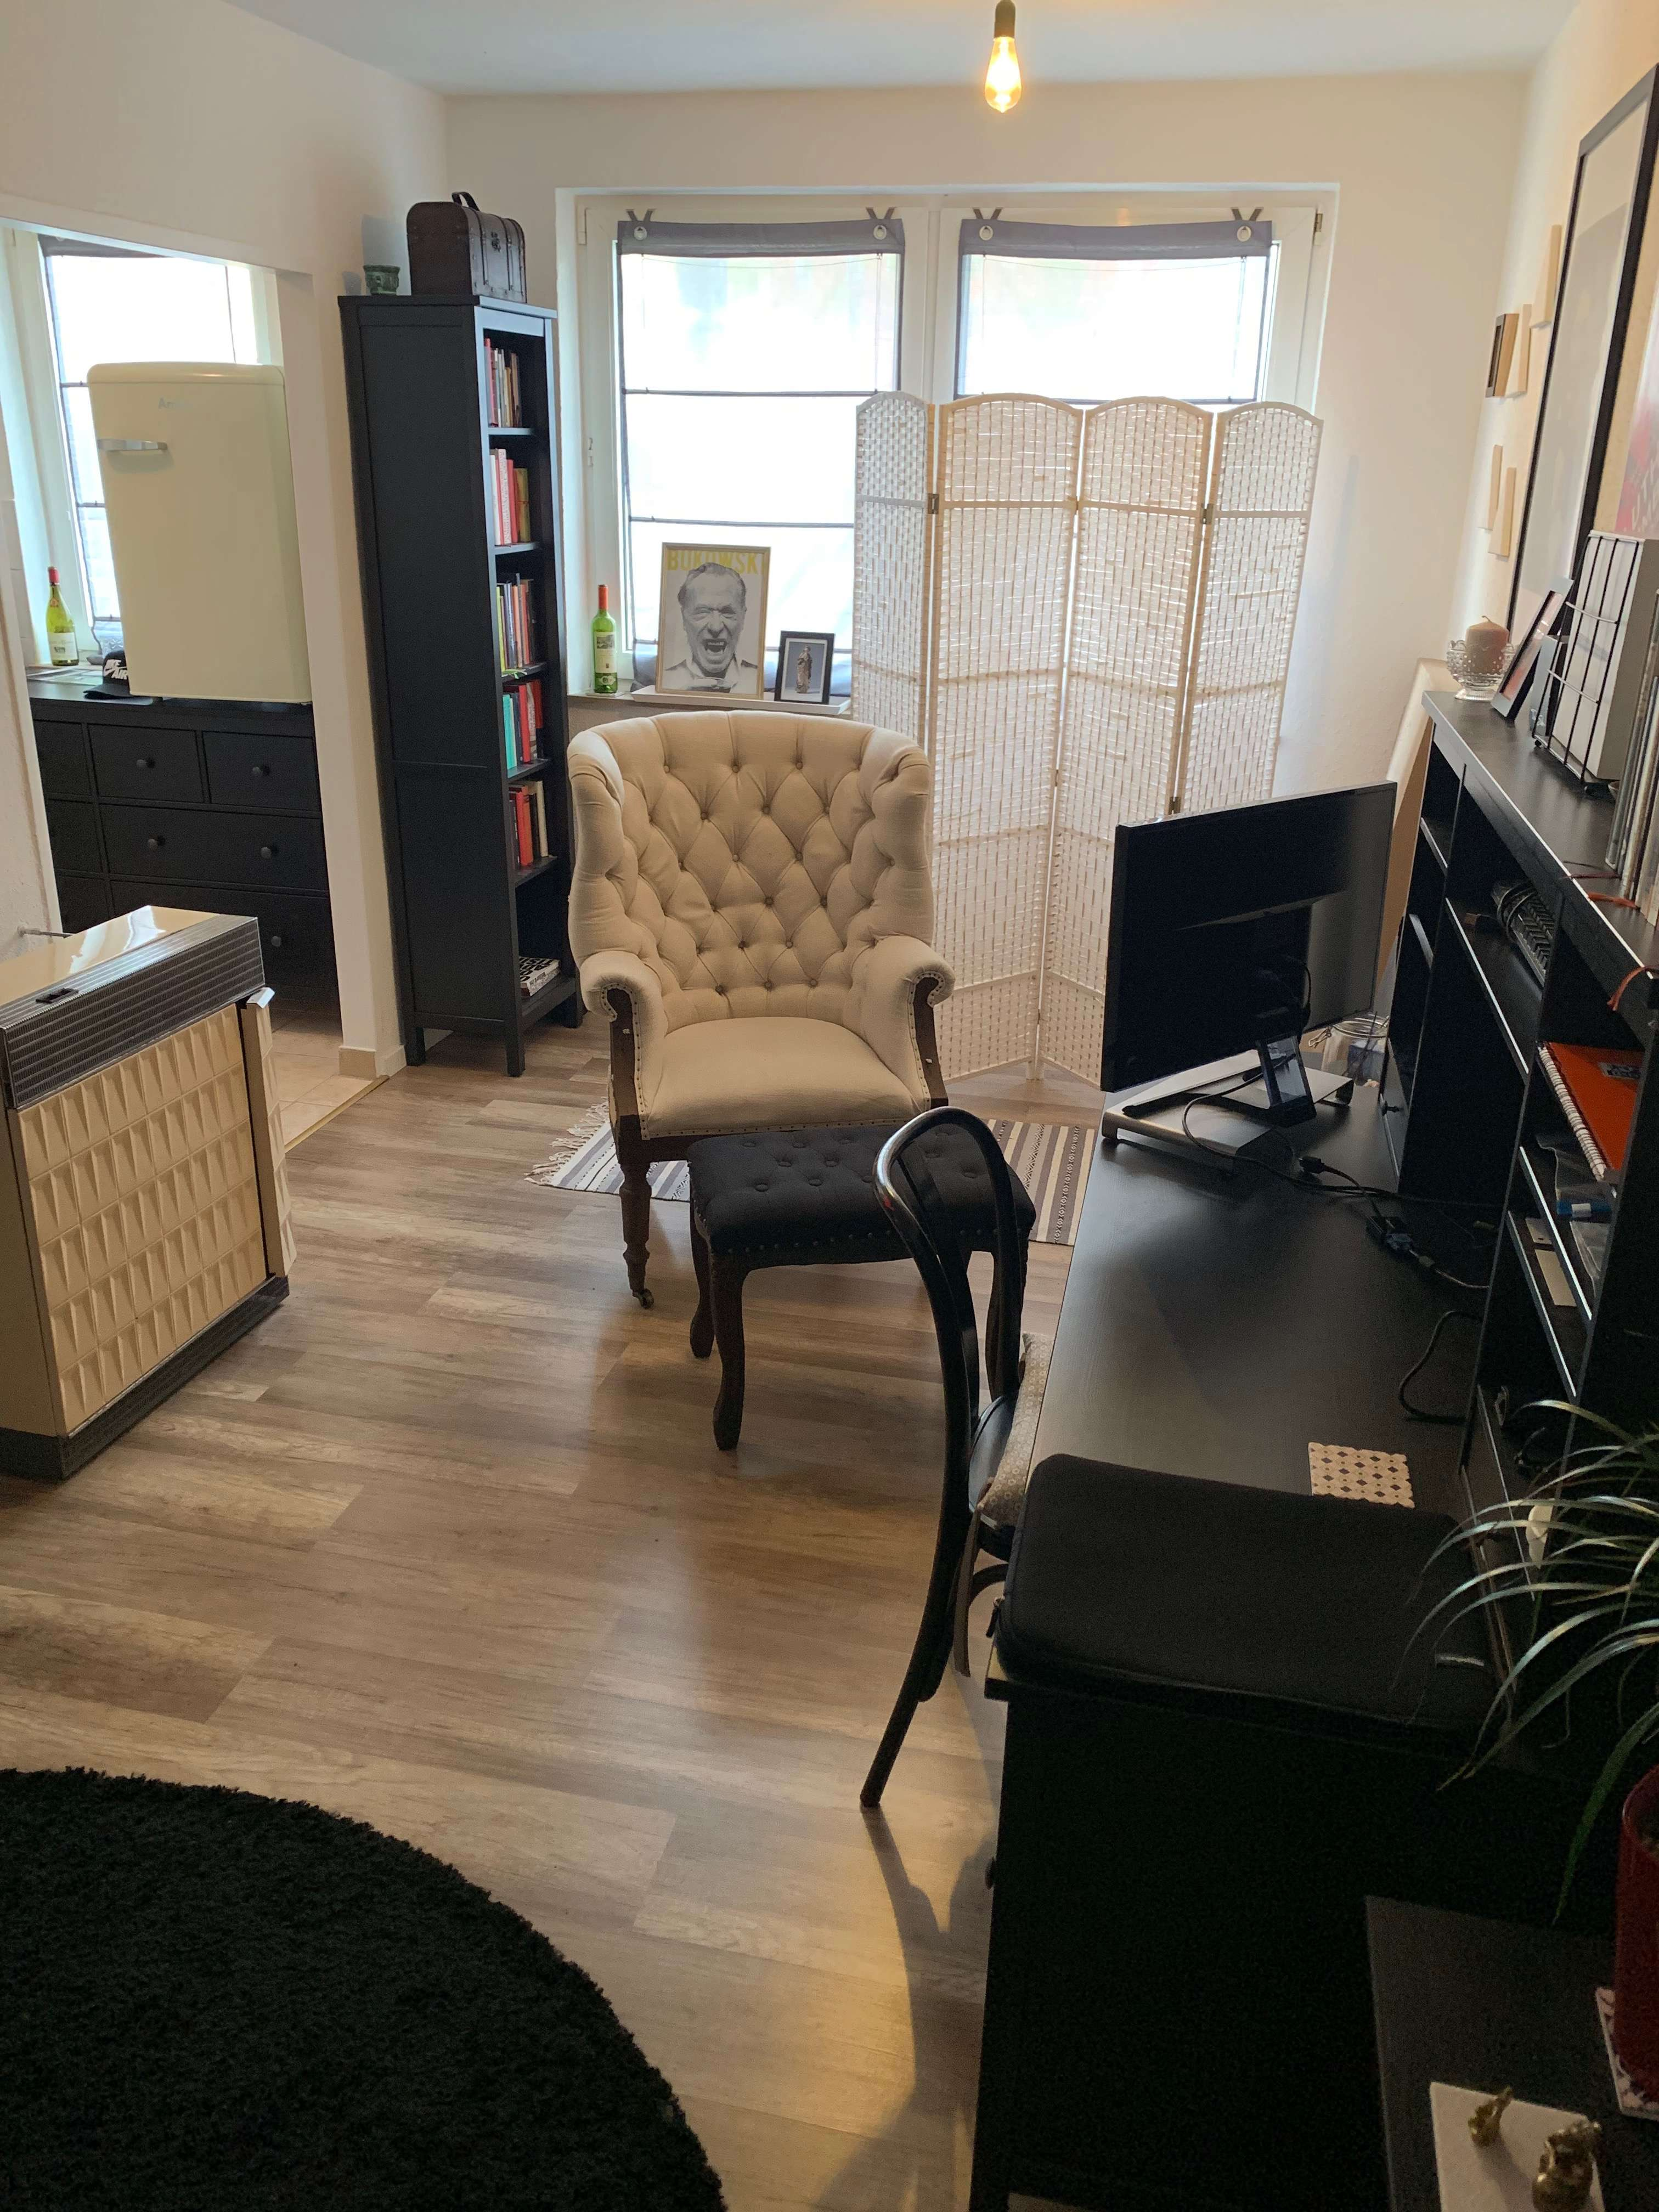 Zabo! renoviert 2-ZW, ca. 40 qm, Laminat, im Erdgeschoss